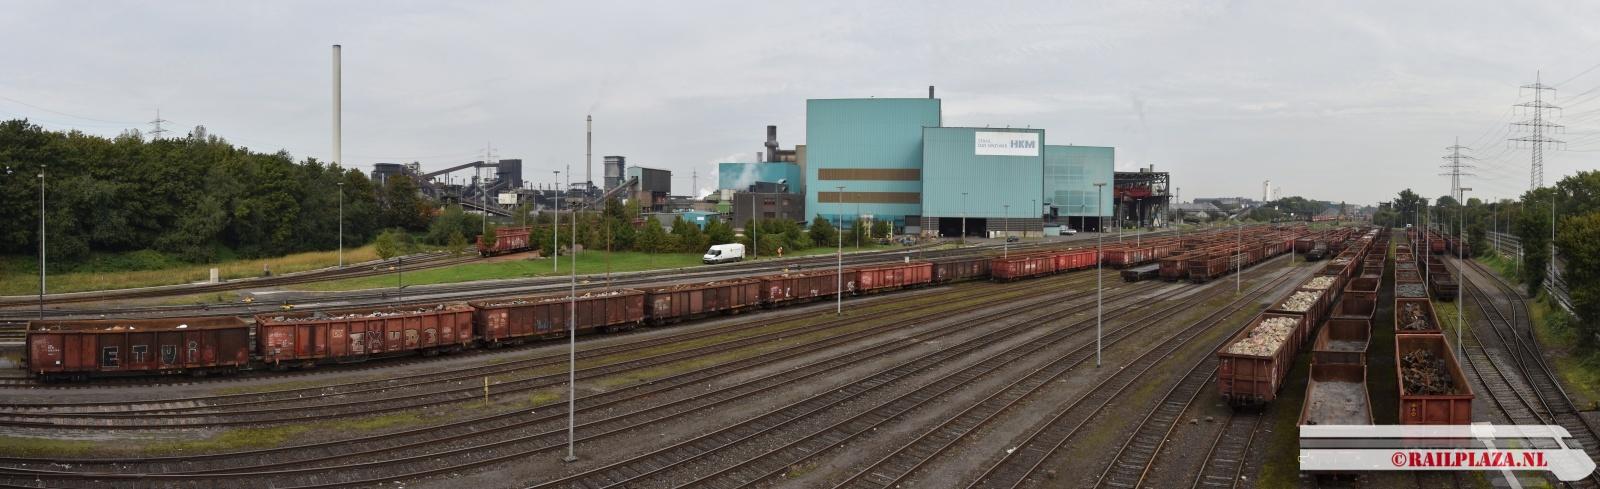 Panorama HKM Duisburg